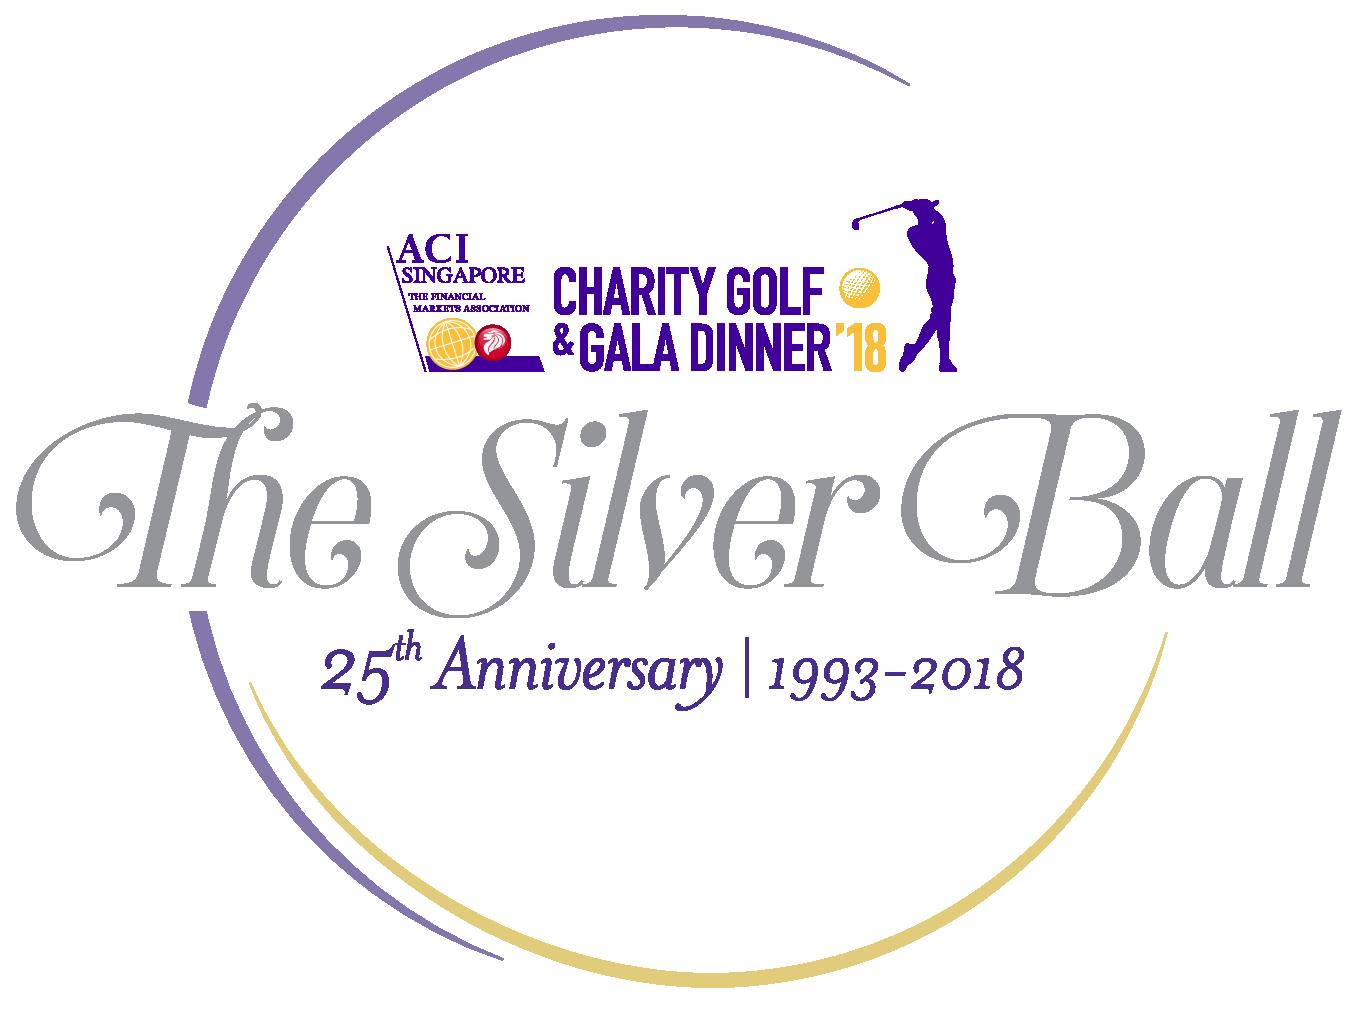 Aci Singapore Aci Singapore 25th Anniversary Charity Golf Gala